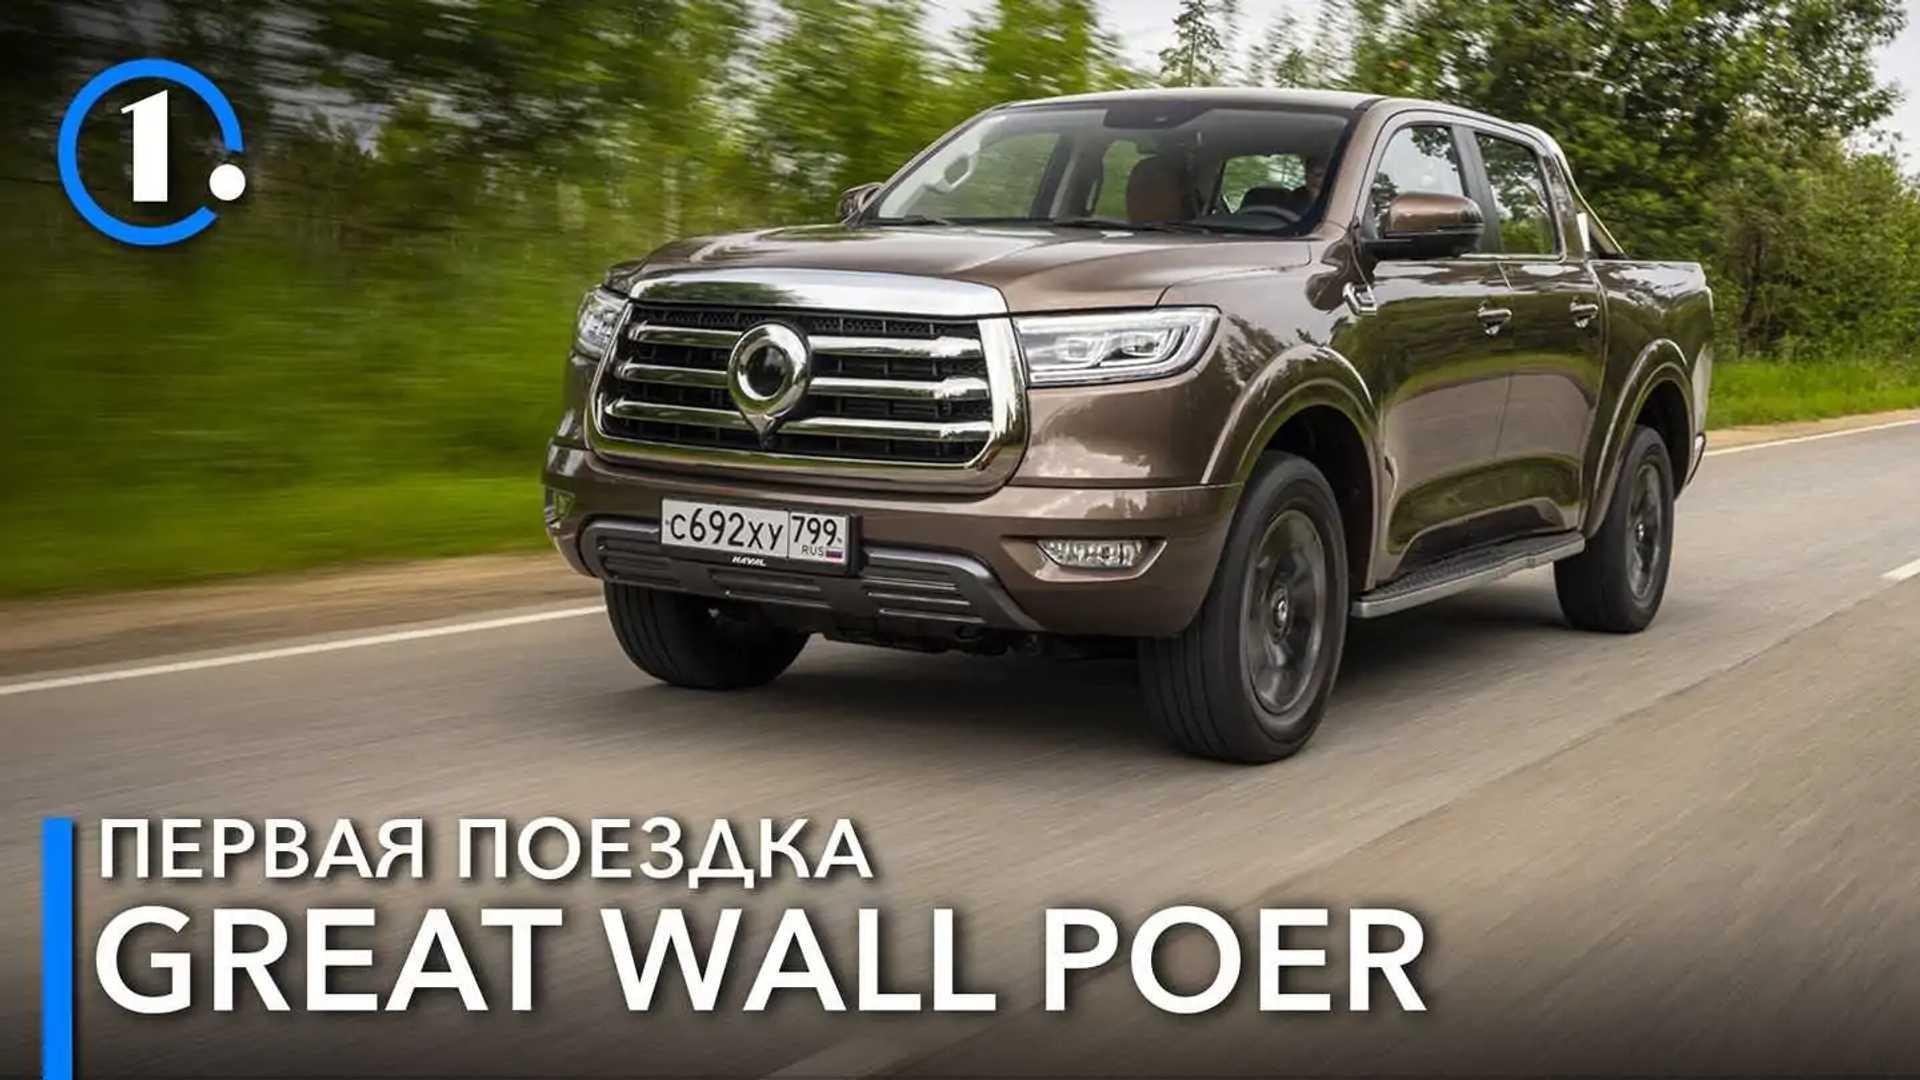 Great Wall Poer: кому адресован гигантский пикап за 2,5 миллиона?